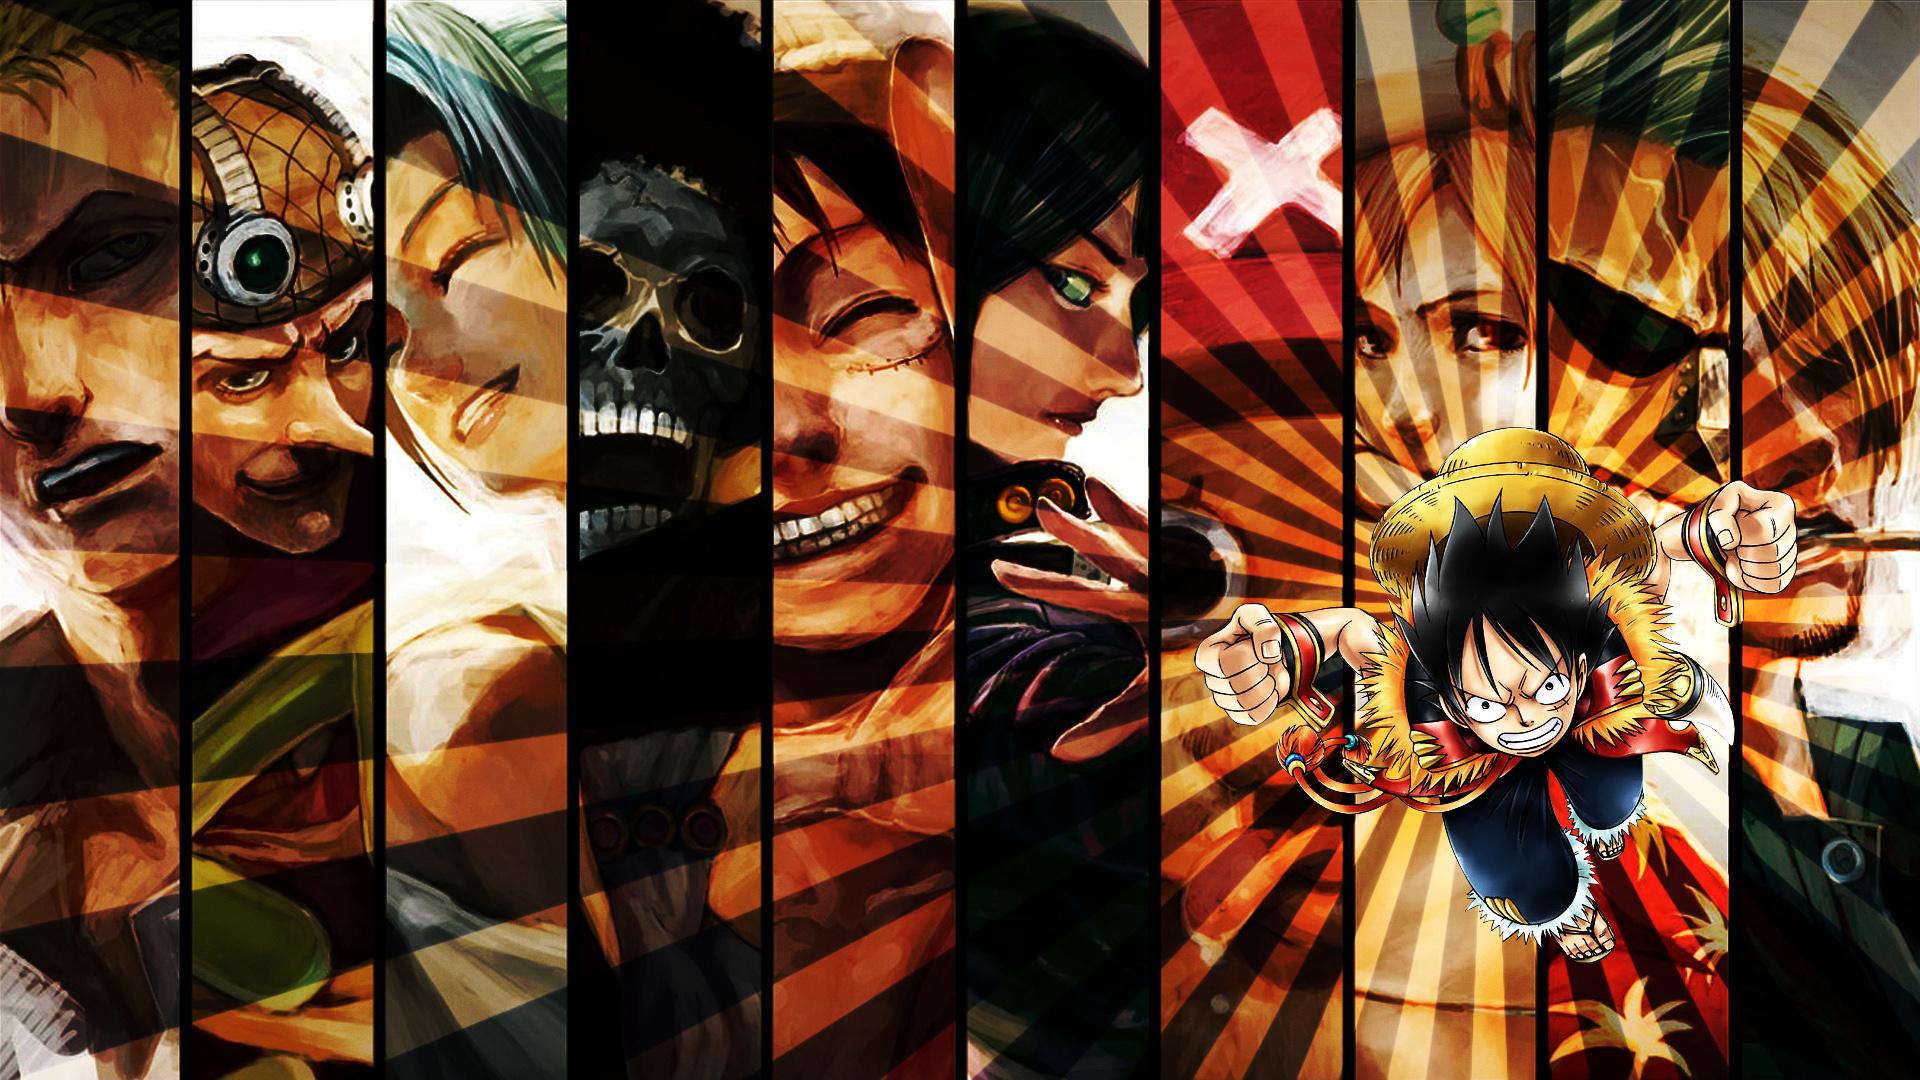 Live Wallpaper Anime One Piece Vinny Oleo Vegetal Info